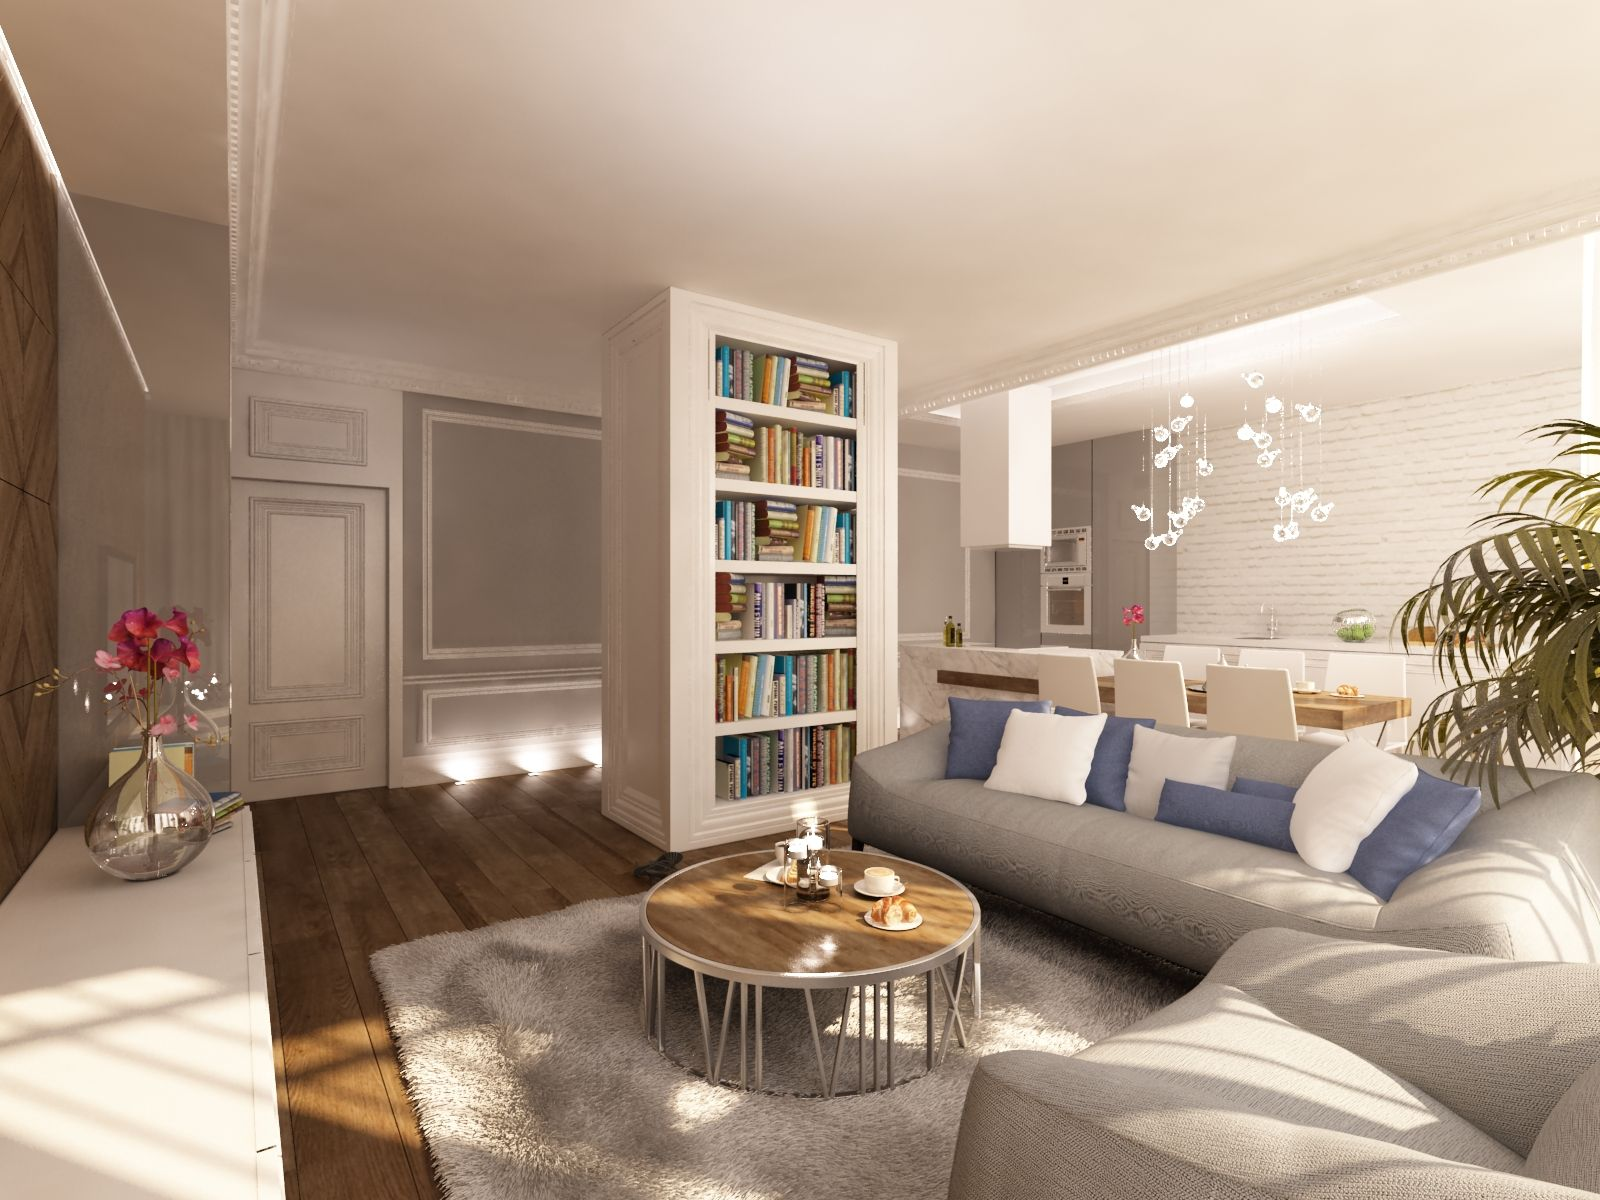 Eklektyczny Salon Z Kuchnia Interior Design Home Decor Home